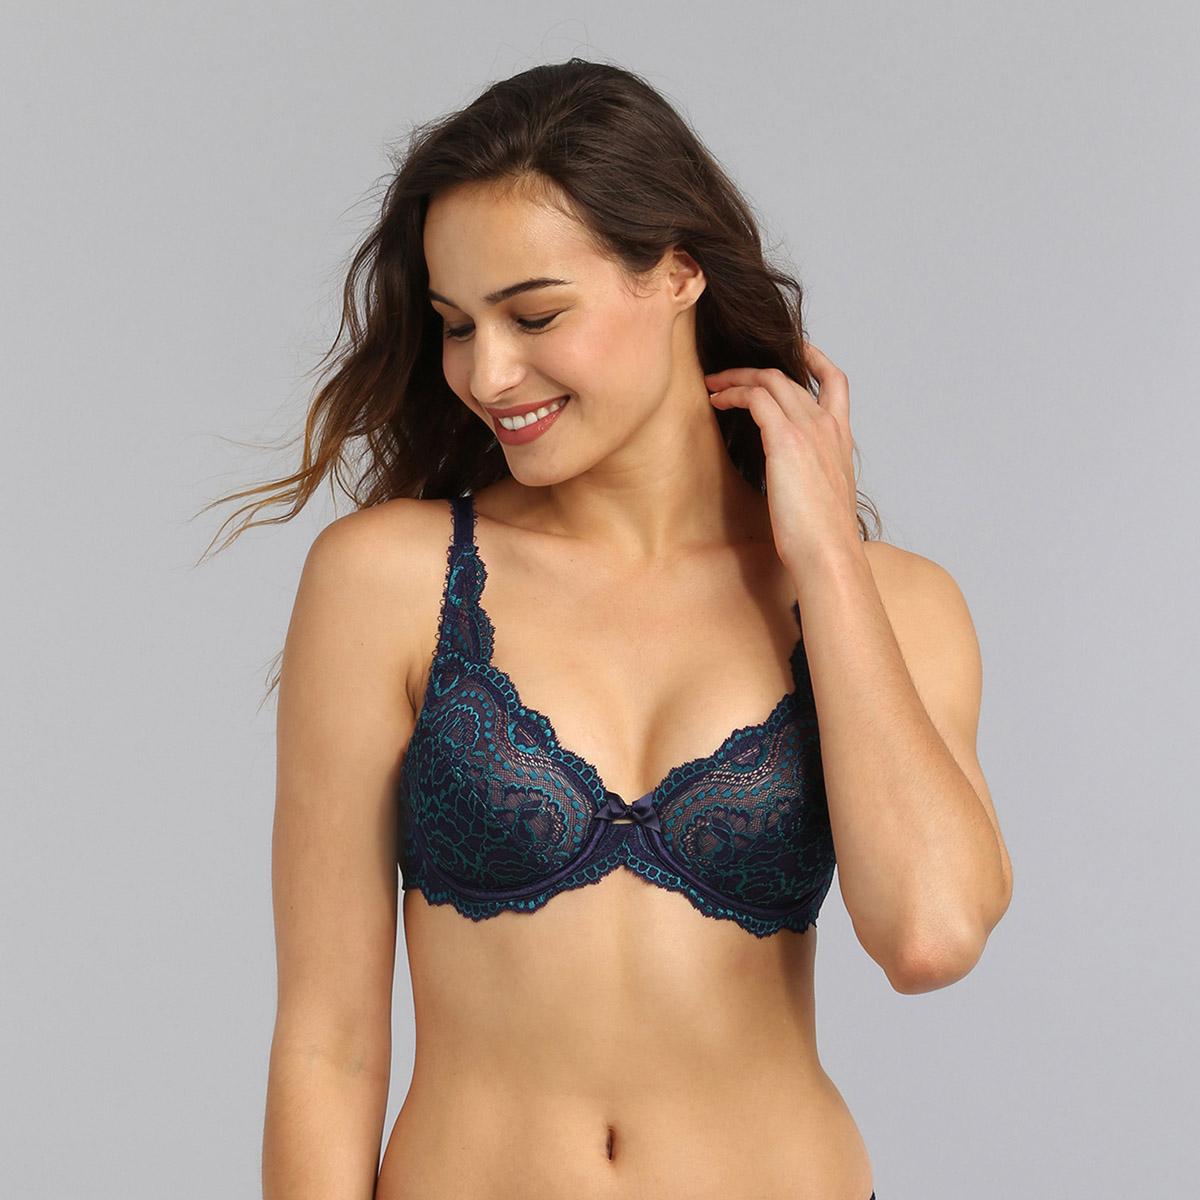 Reggiseno con ferretto blu marino Flowery Lace, , PLAYTEX